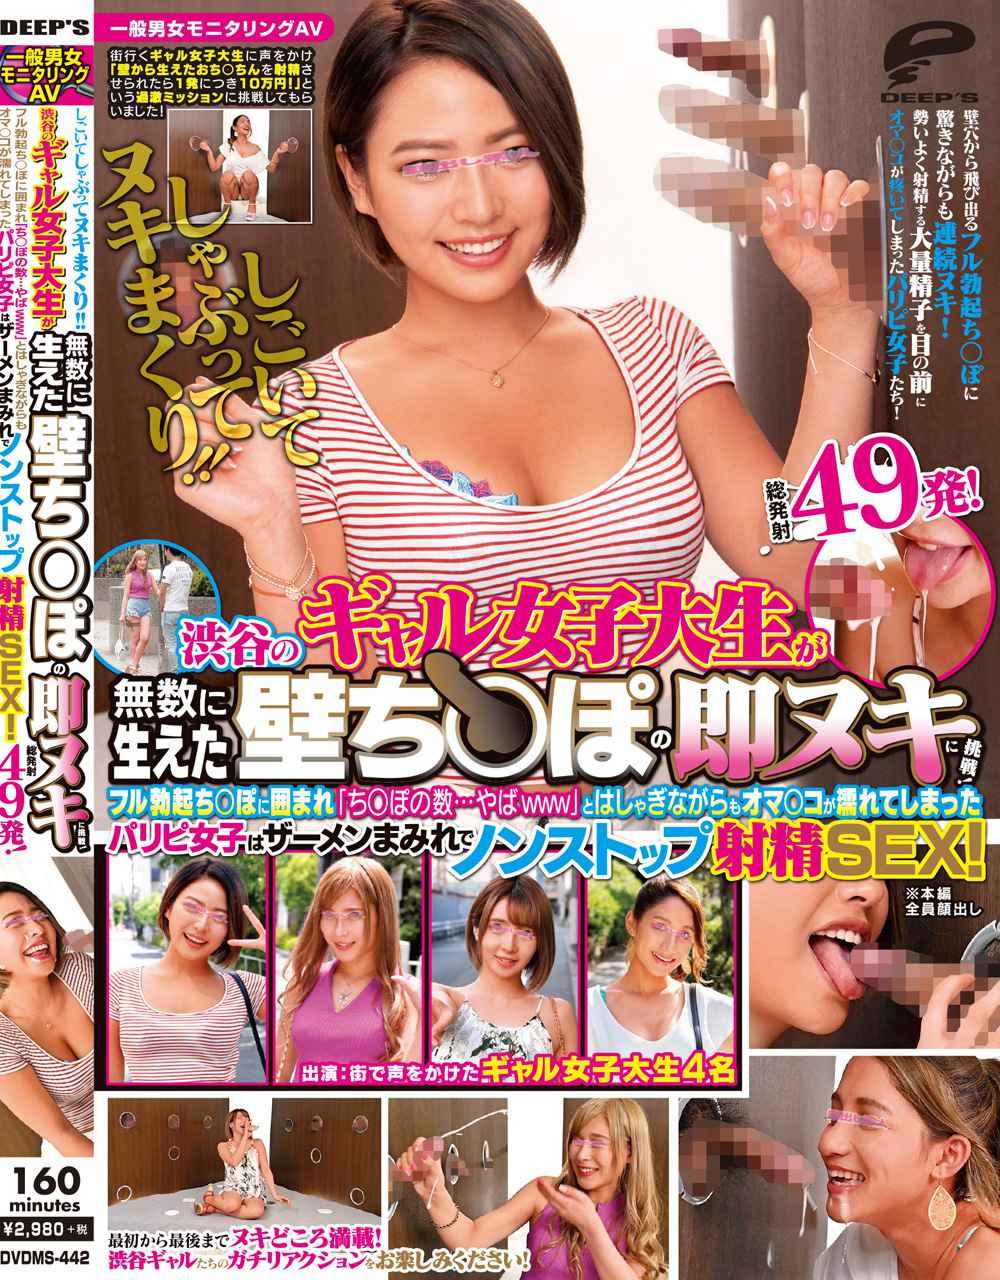 DVDMS-442:ジャケット